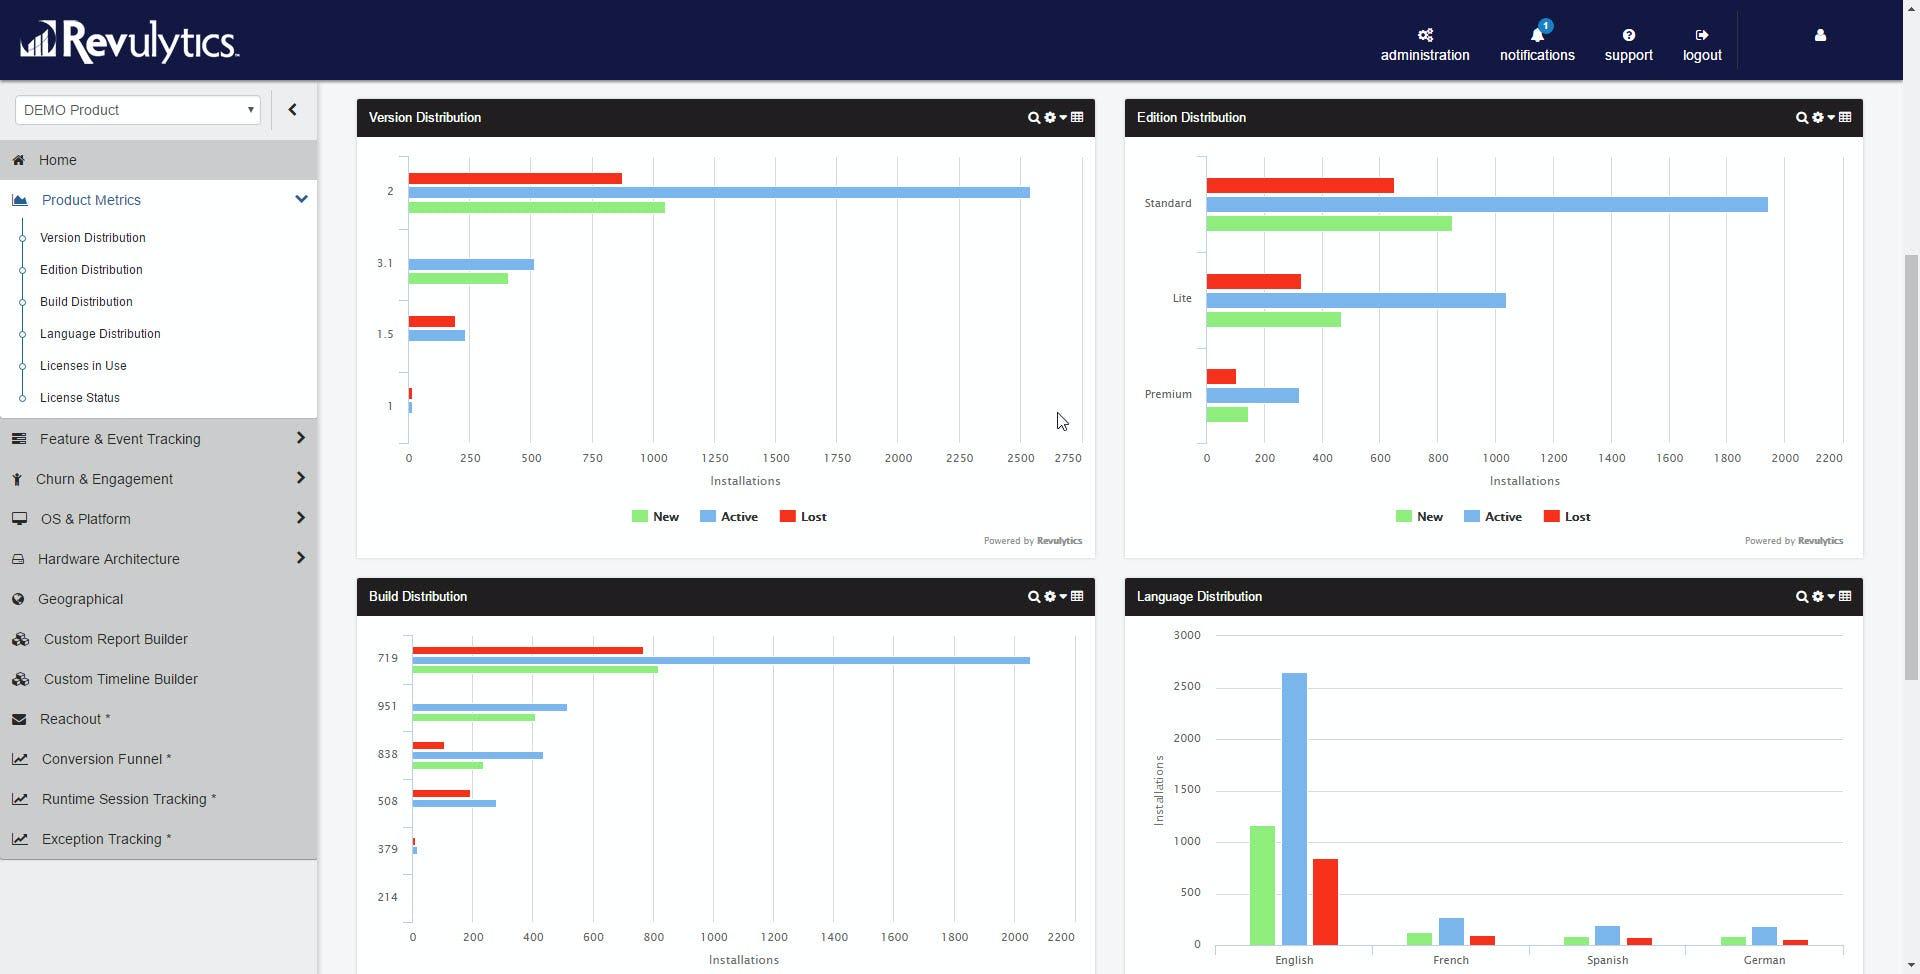 Usage Intelligence Software - Product metrics